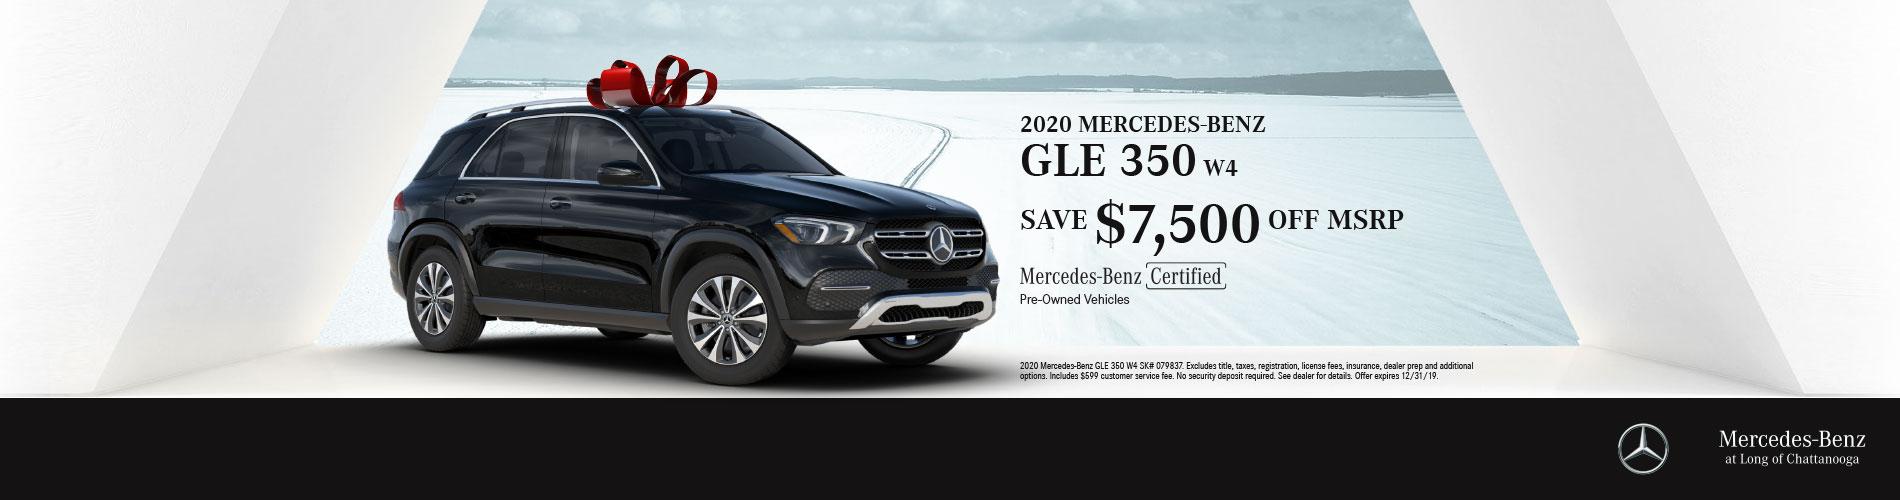 2020 Mercedes-Benz GLE 350 Special near Athens TN